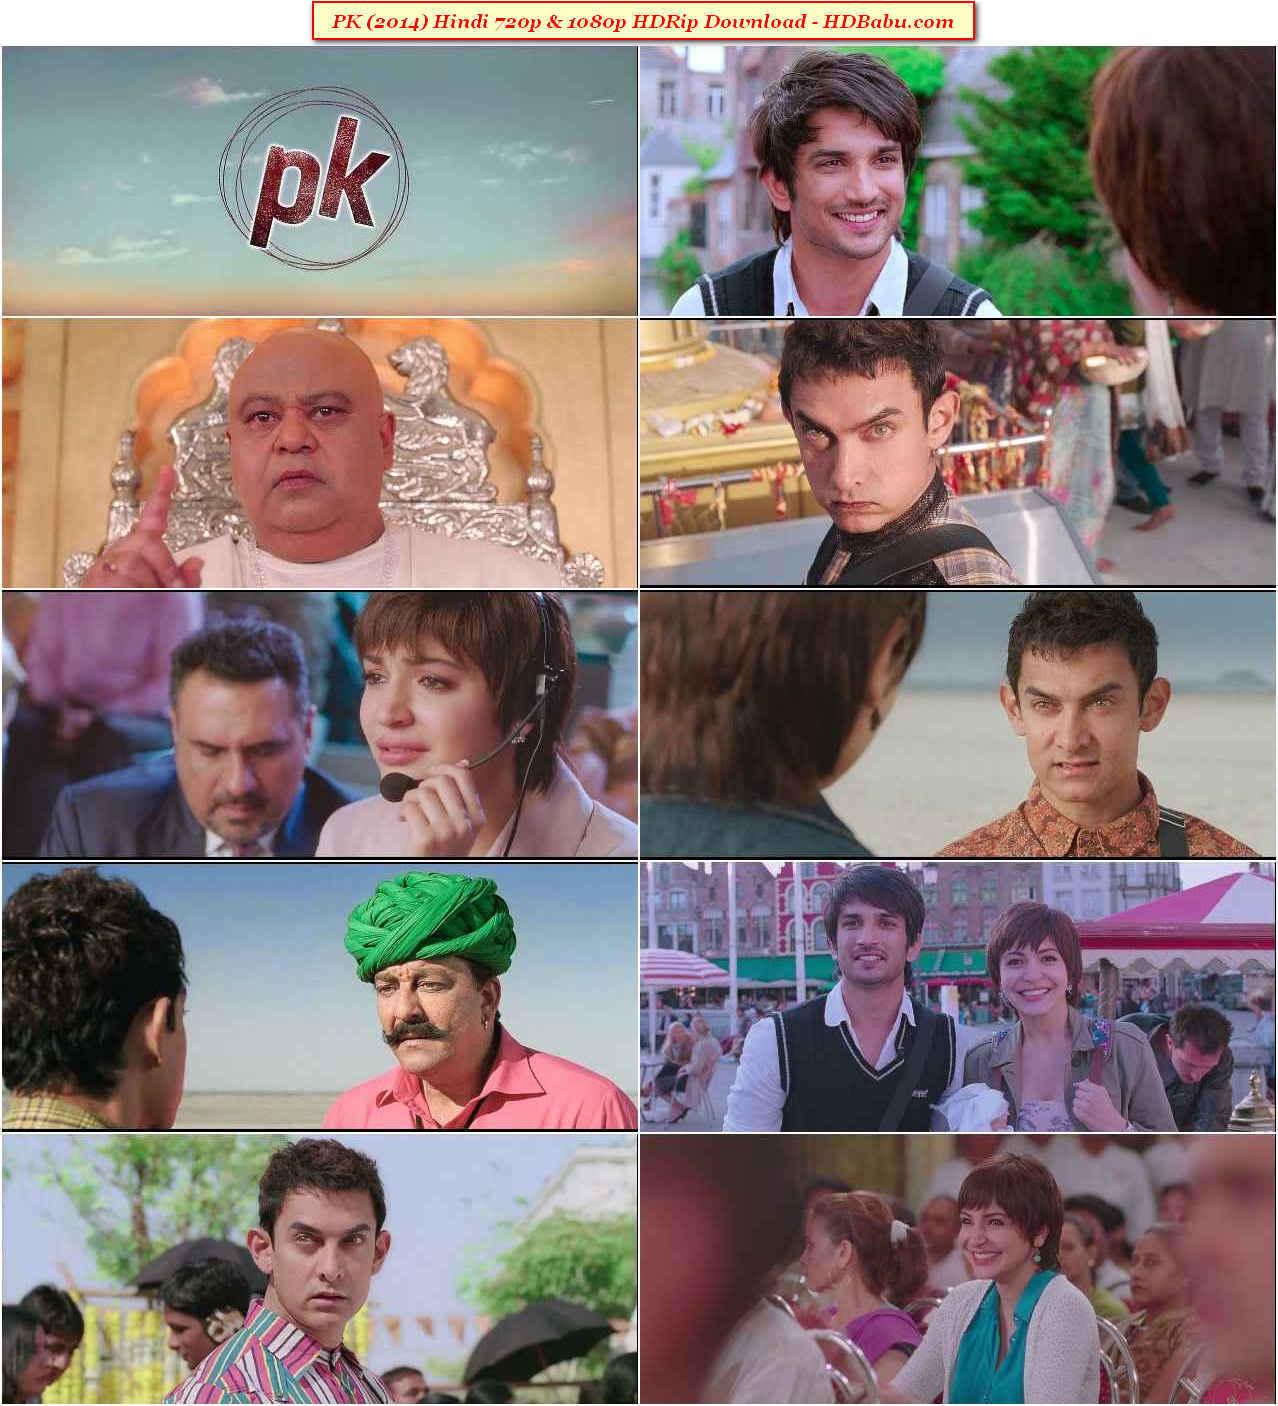 PK Full Movie Download